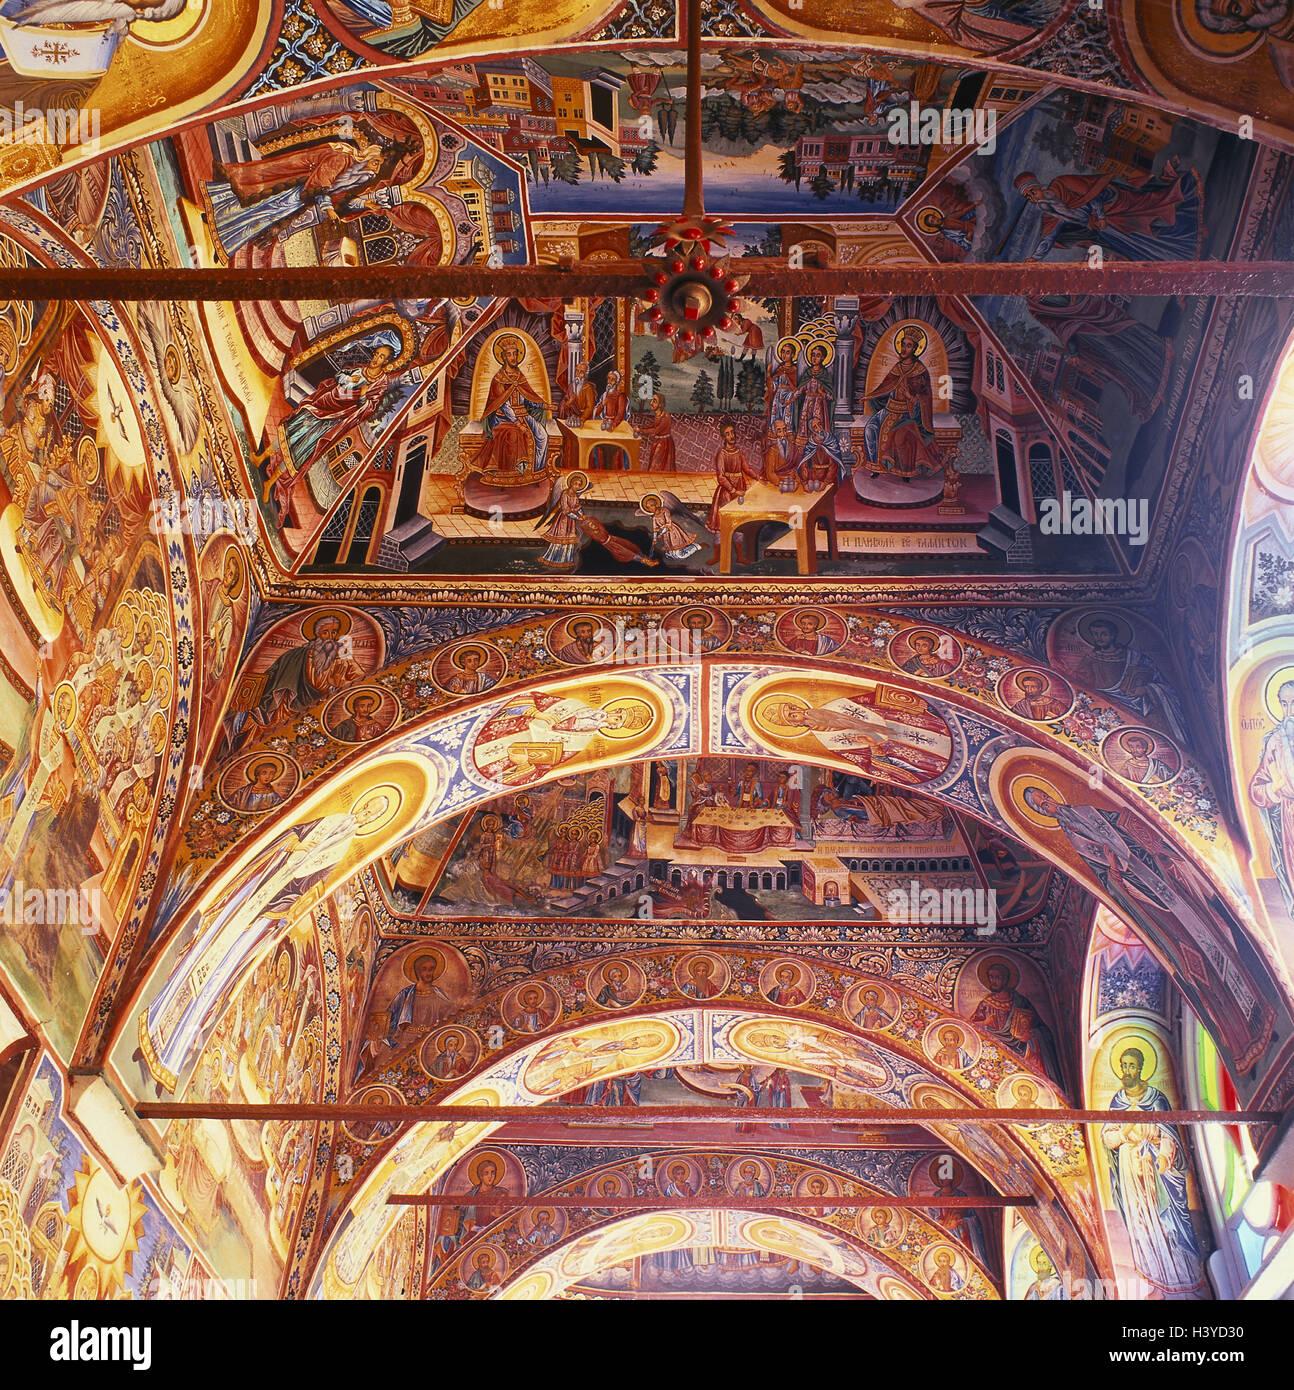 Greece, Athos, cloister, Lawras, Katholikon, arcade, frescoes Hagion Oros, Ajion Oros, Chalkidike, Chalkidiki, peninsula, - Stock Image